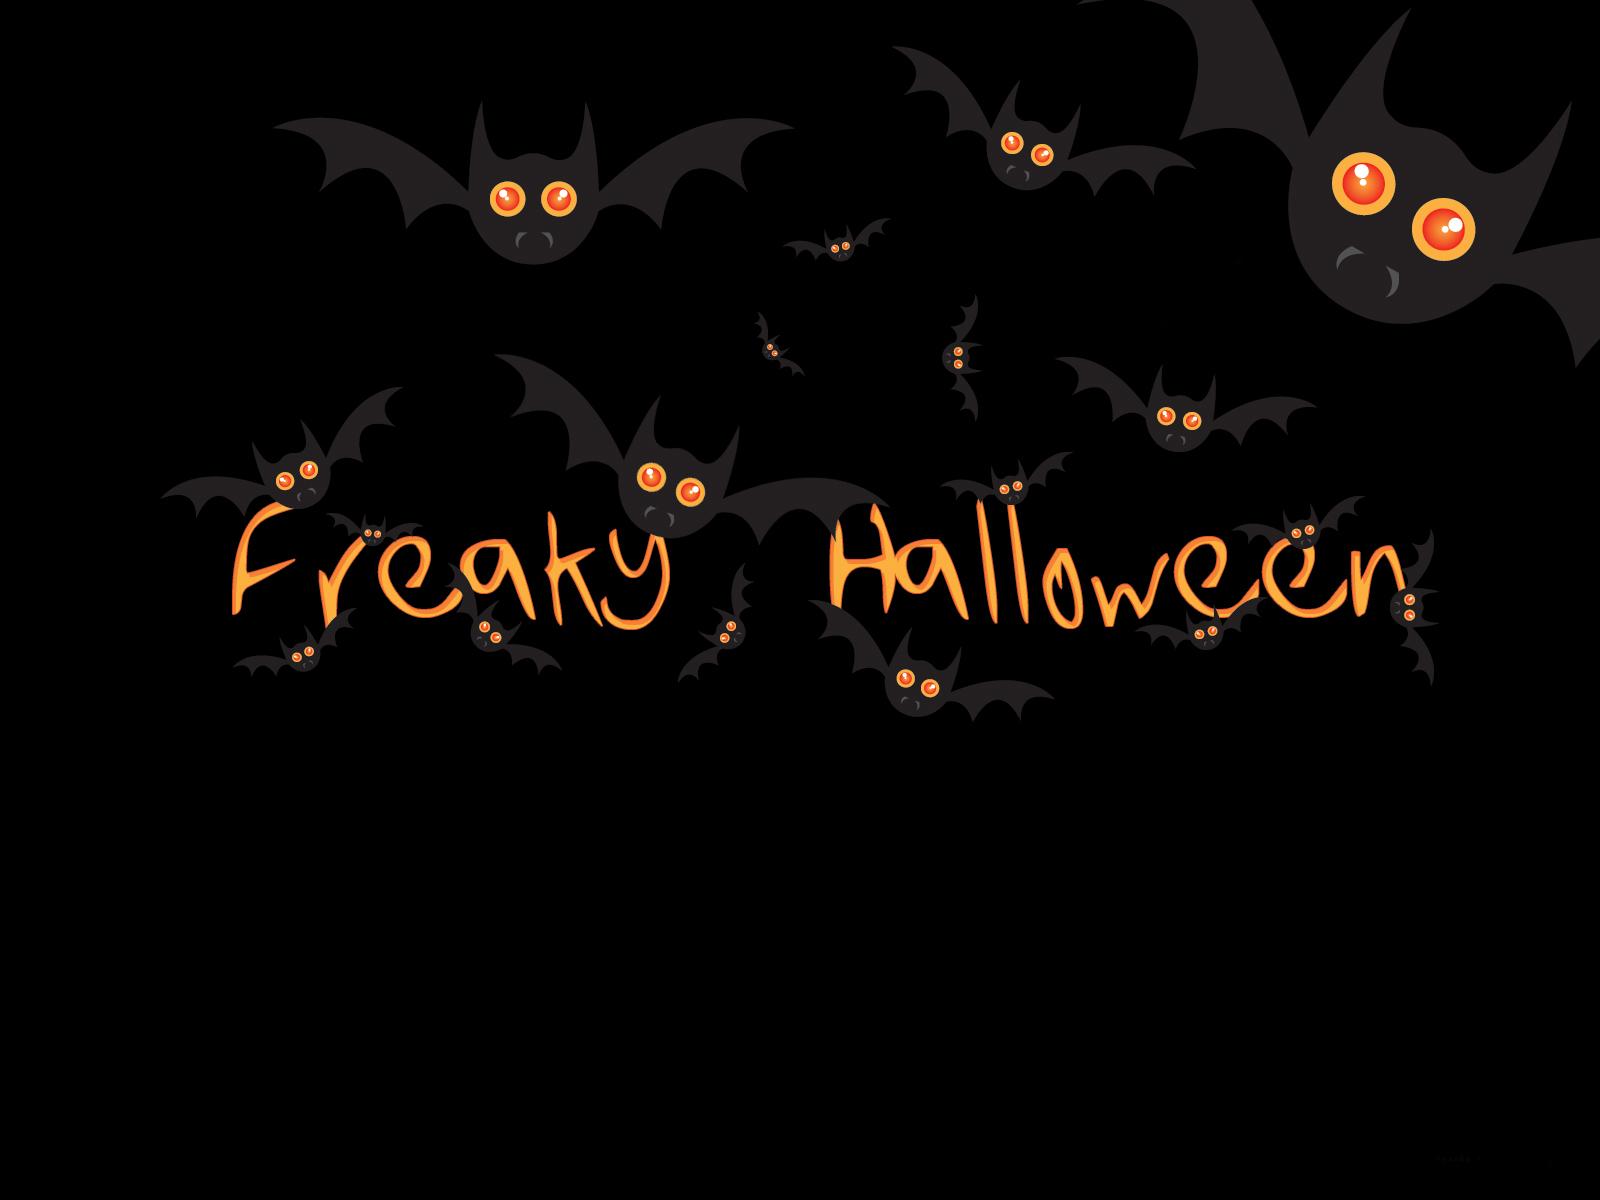 Animated Halloween Wallpapers with Music - WallpaperSafari